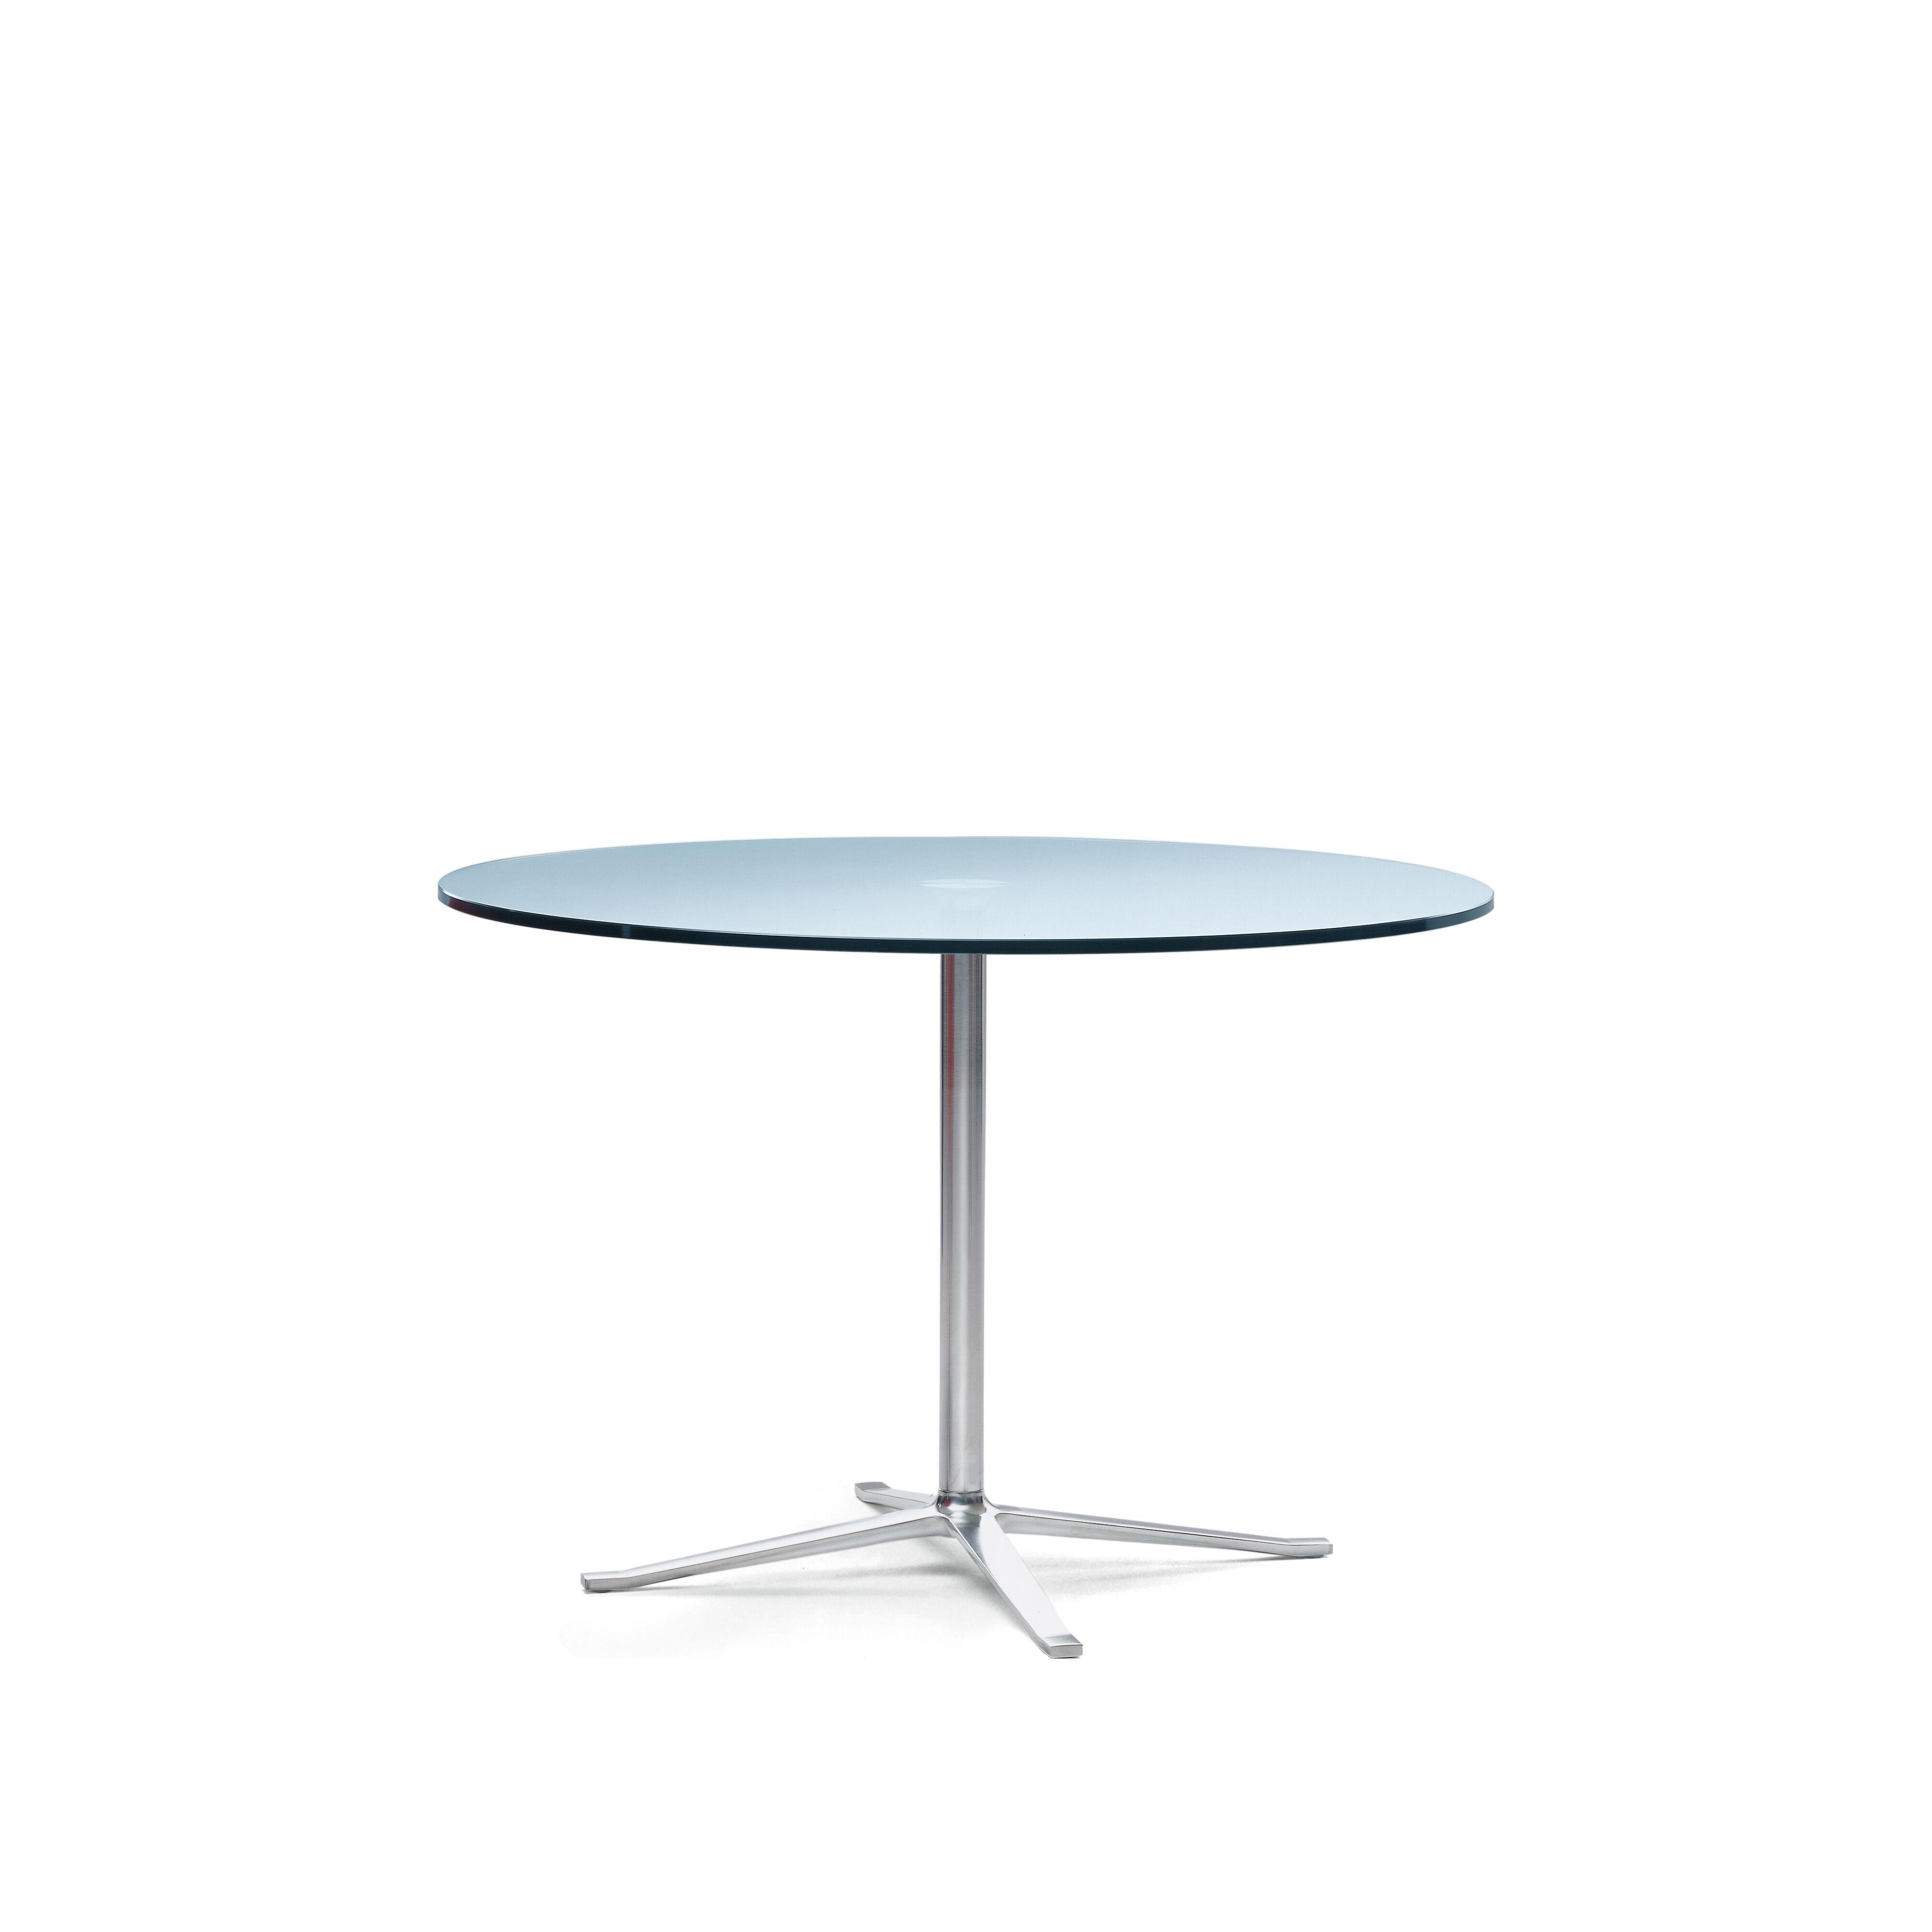 WK-X_Table-0001-H.tif